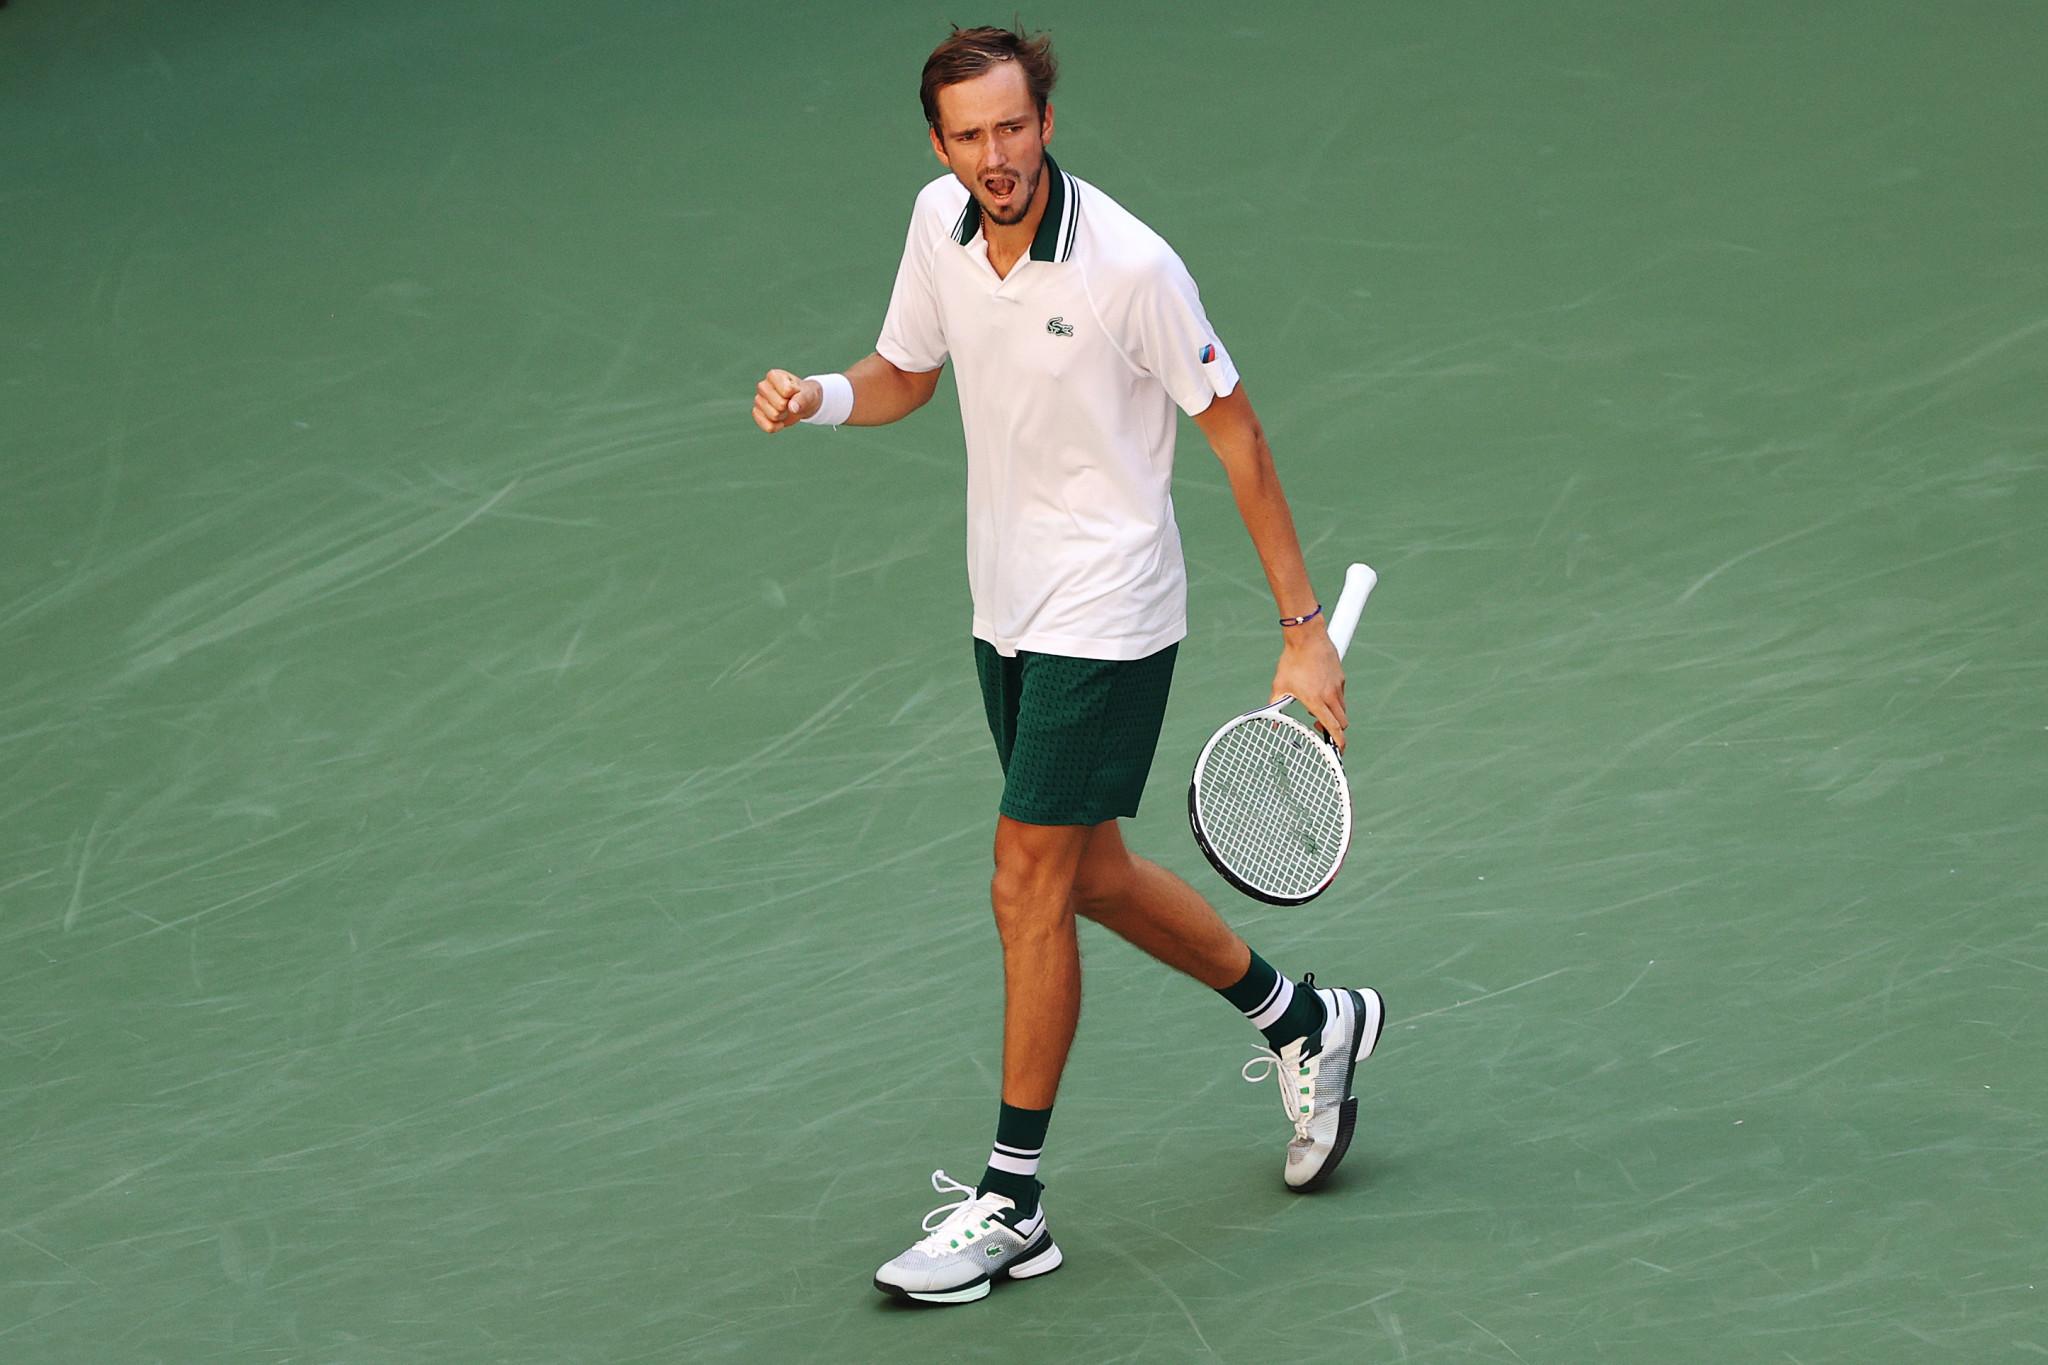 Medvedev ends Van de Zandschulp run to advance to US Open men's singles semi-final against Auger-Aliassime